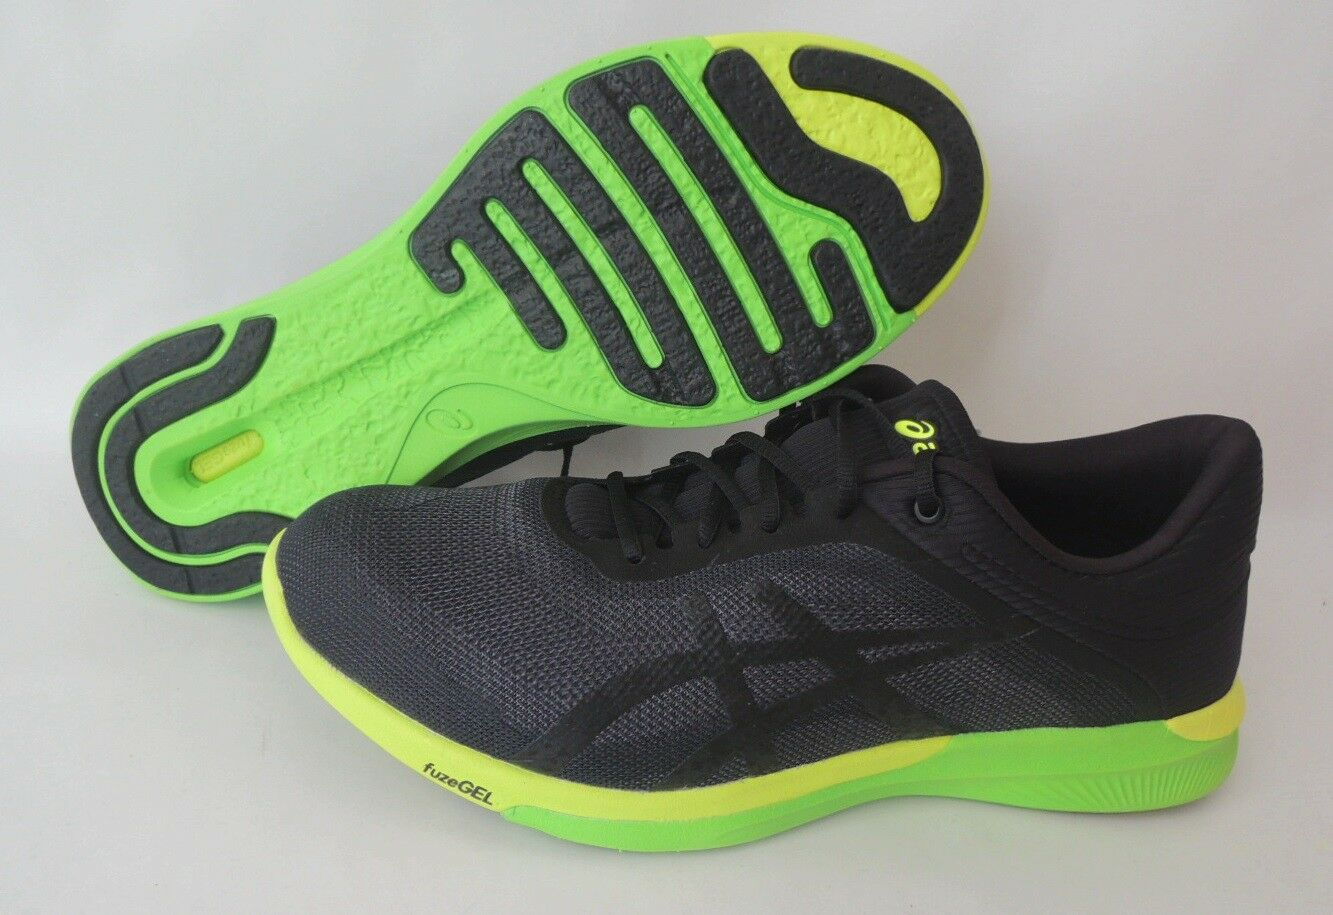 NEU Asics Gel fuzeX Rush Größe 42 42 42 Running Schuhe Laufschuhe T718N-9790 TOP af62ff